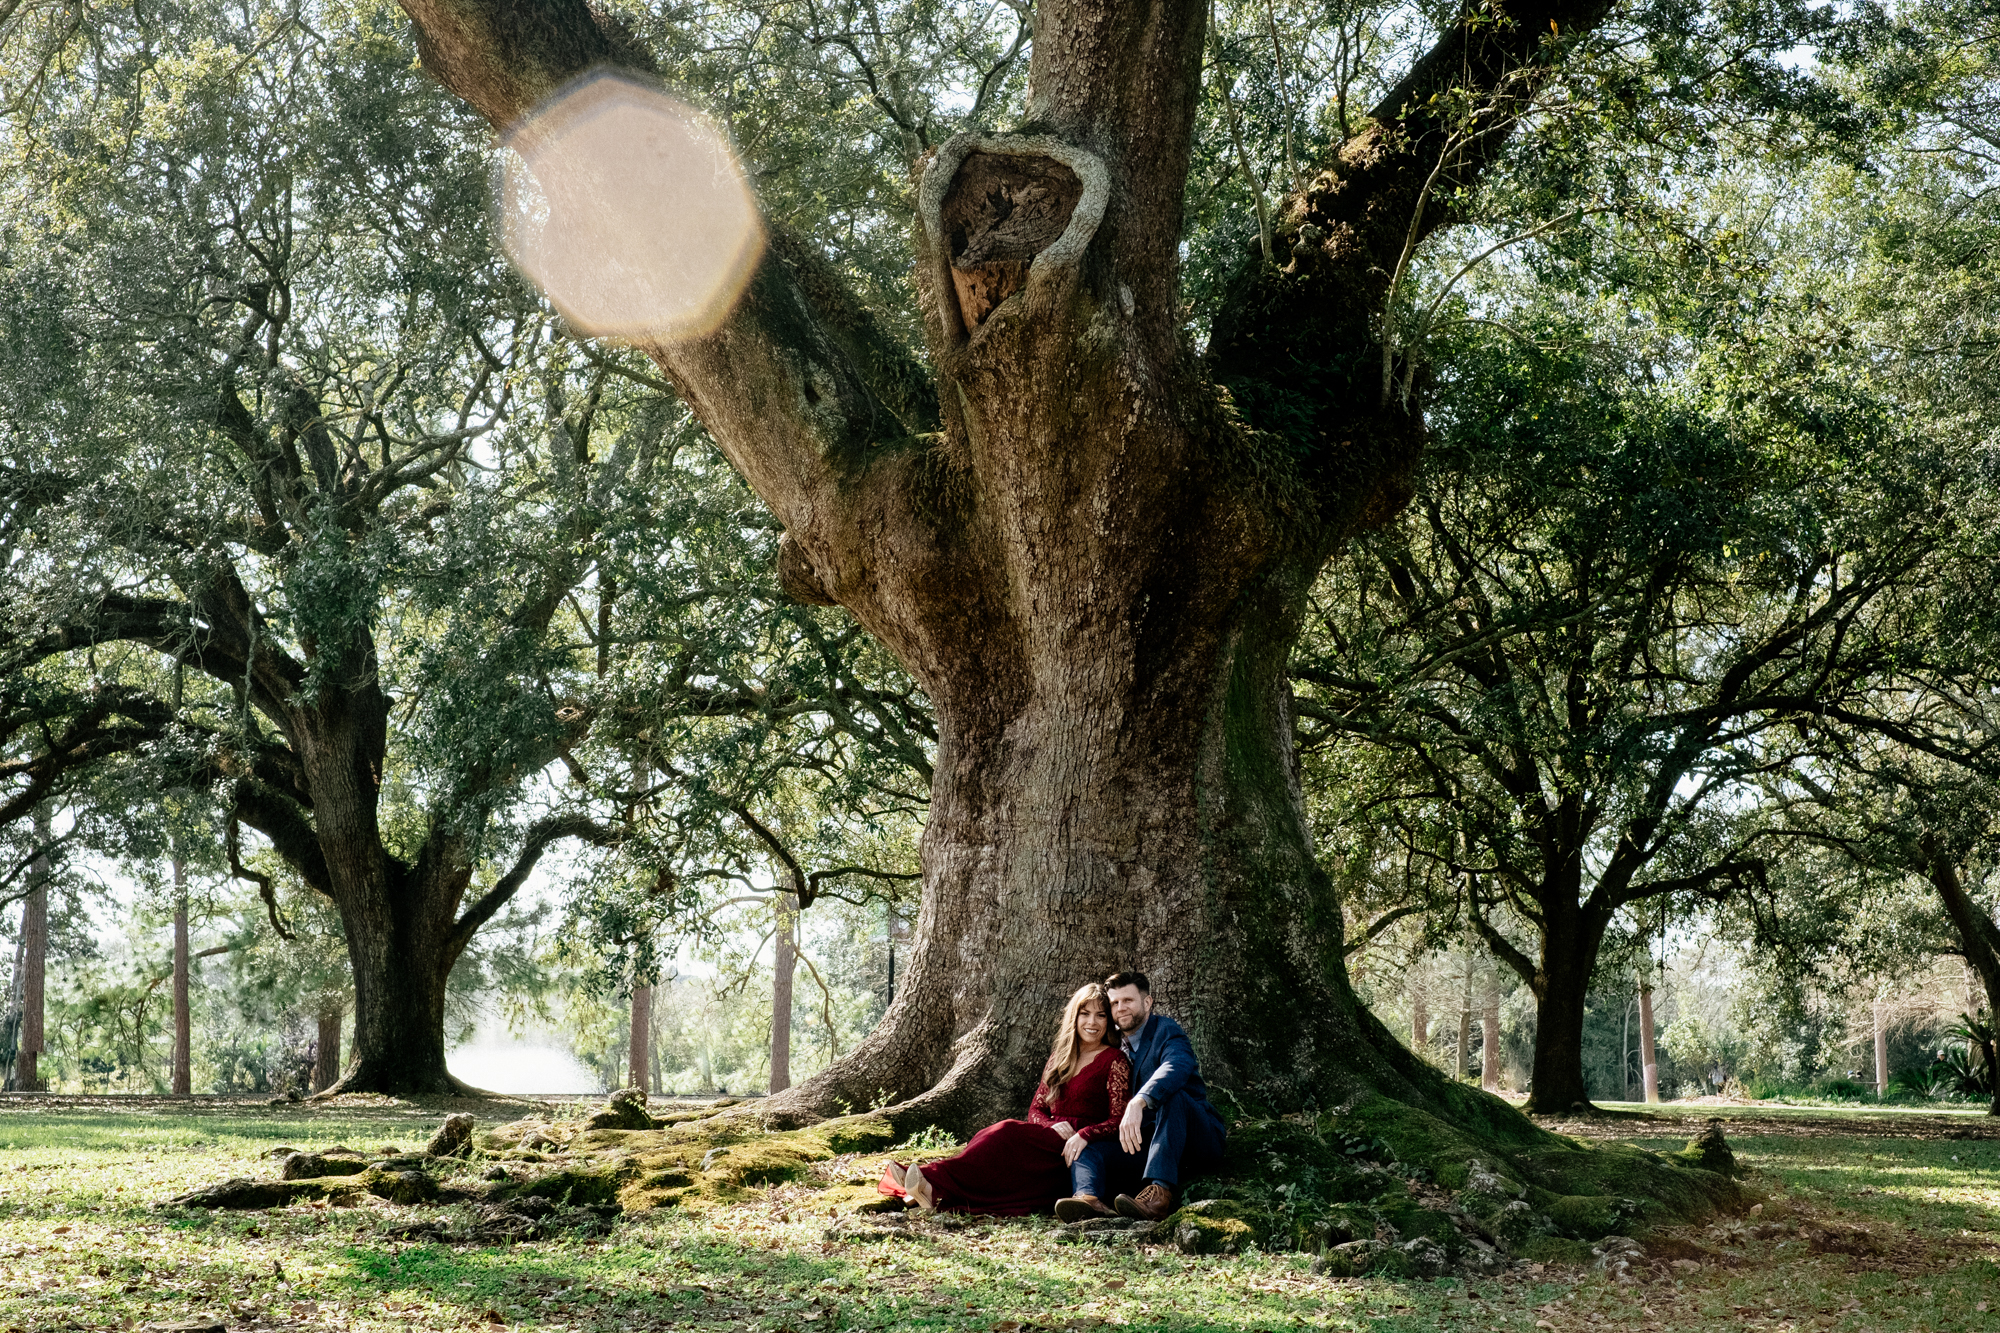 Jen_Montgomery_Photography_Angela_Brian_Engagement_Proposal_FB-141.jpg